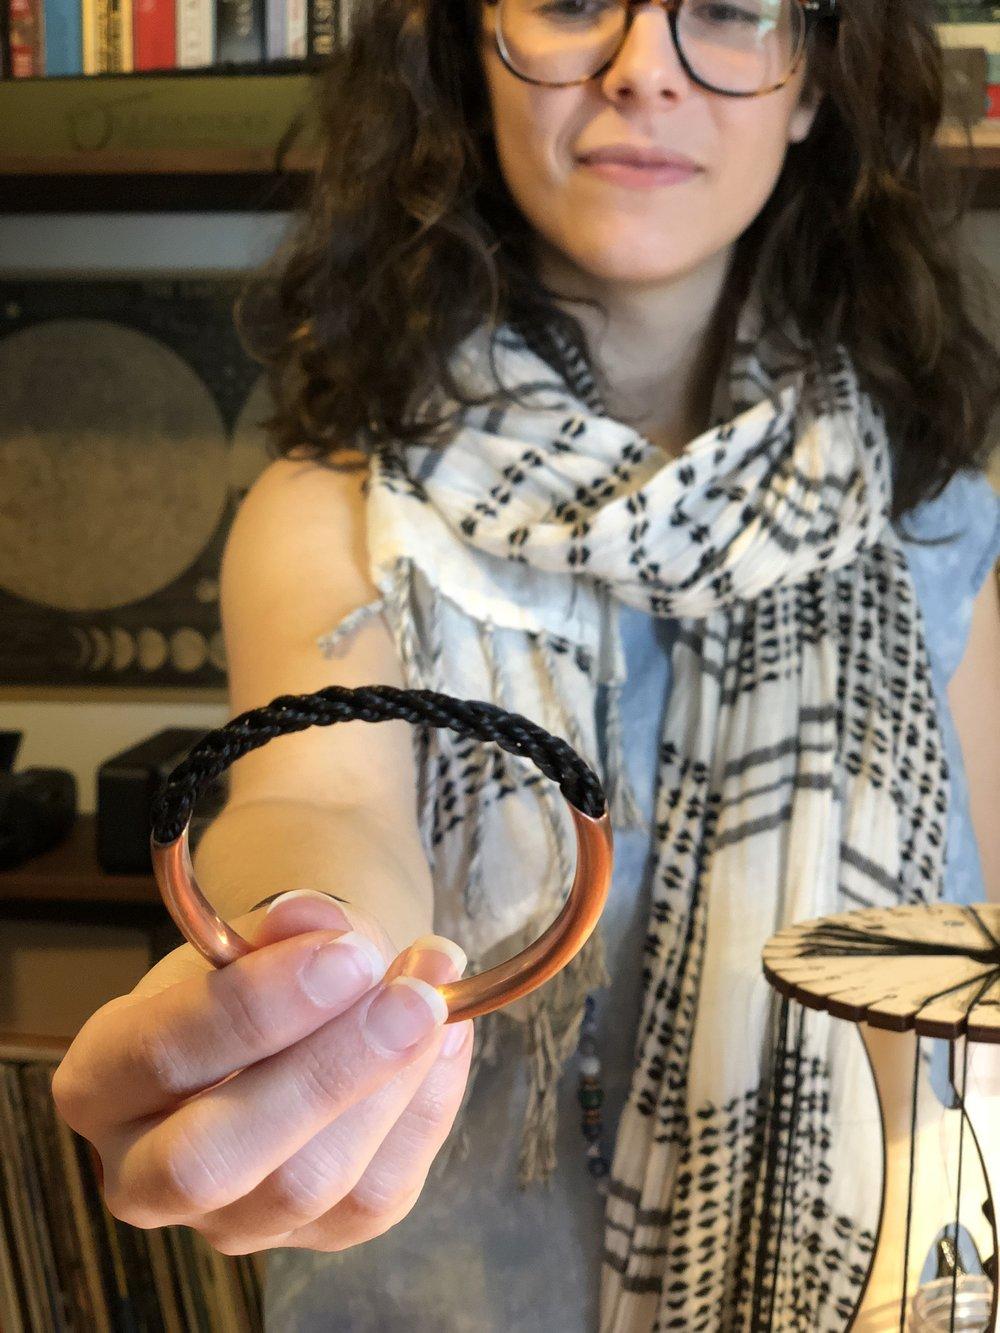 copperelegy-jewelery-human-hair-living-high-vibe-inspirational-video